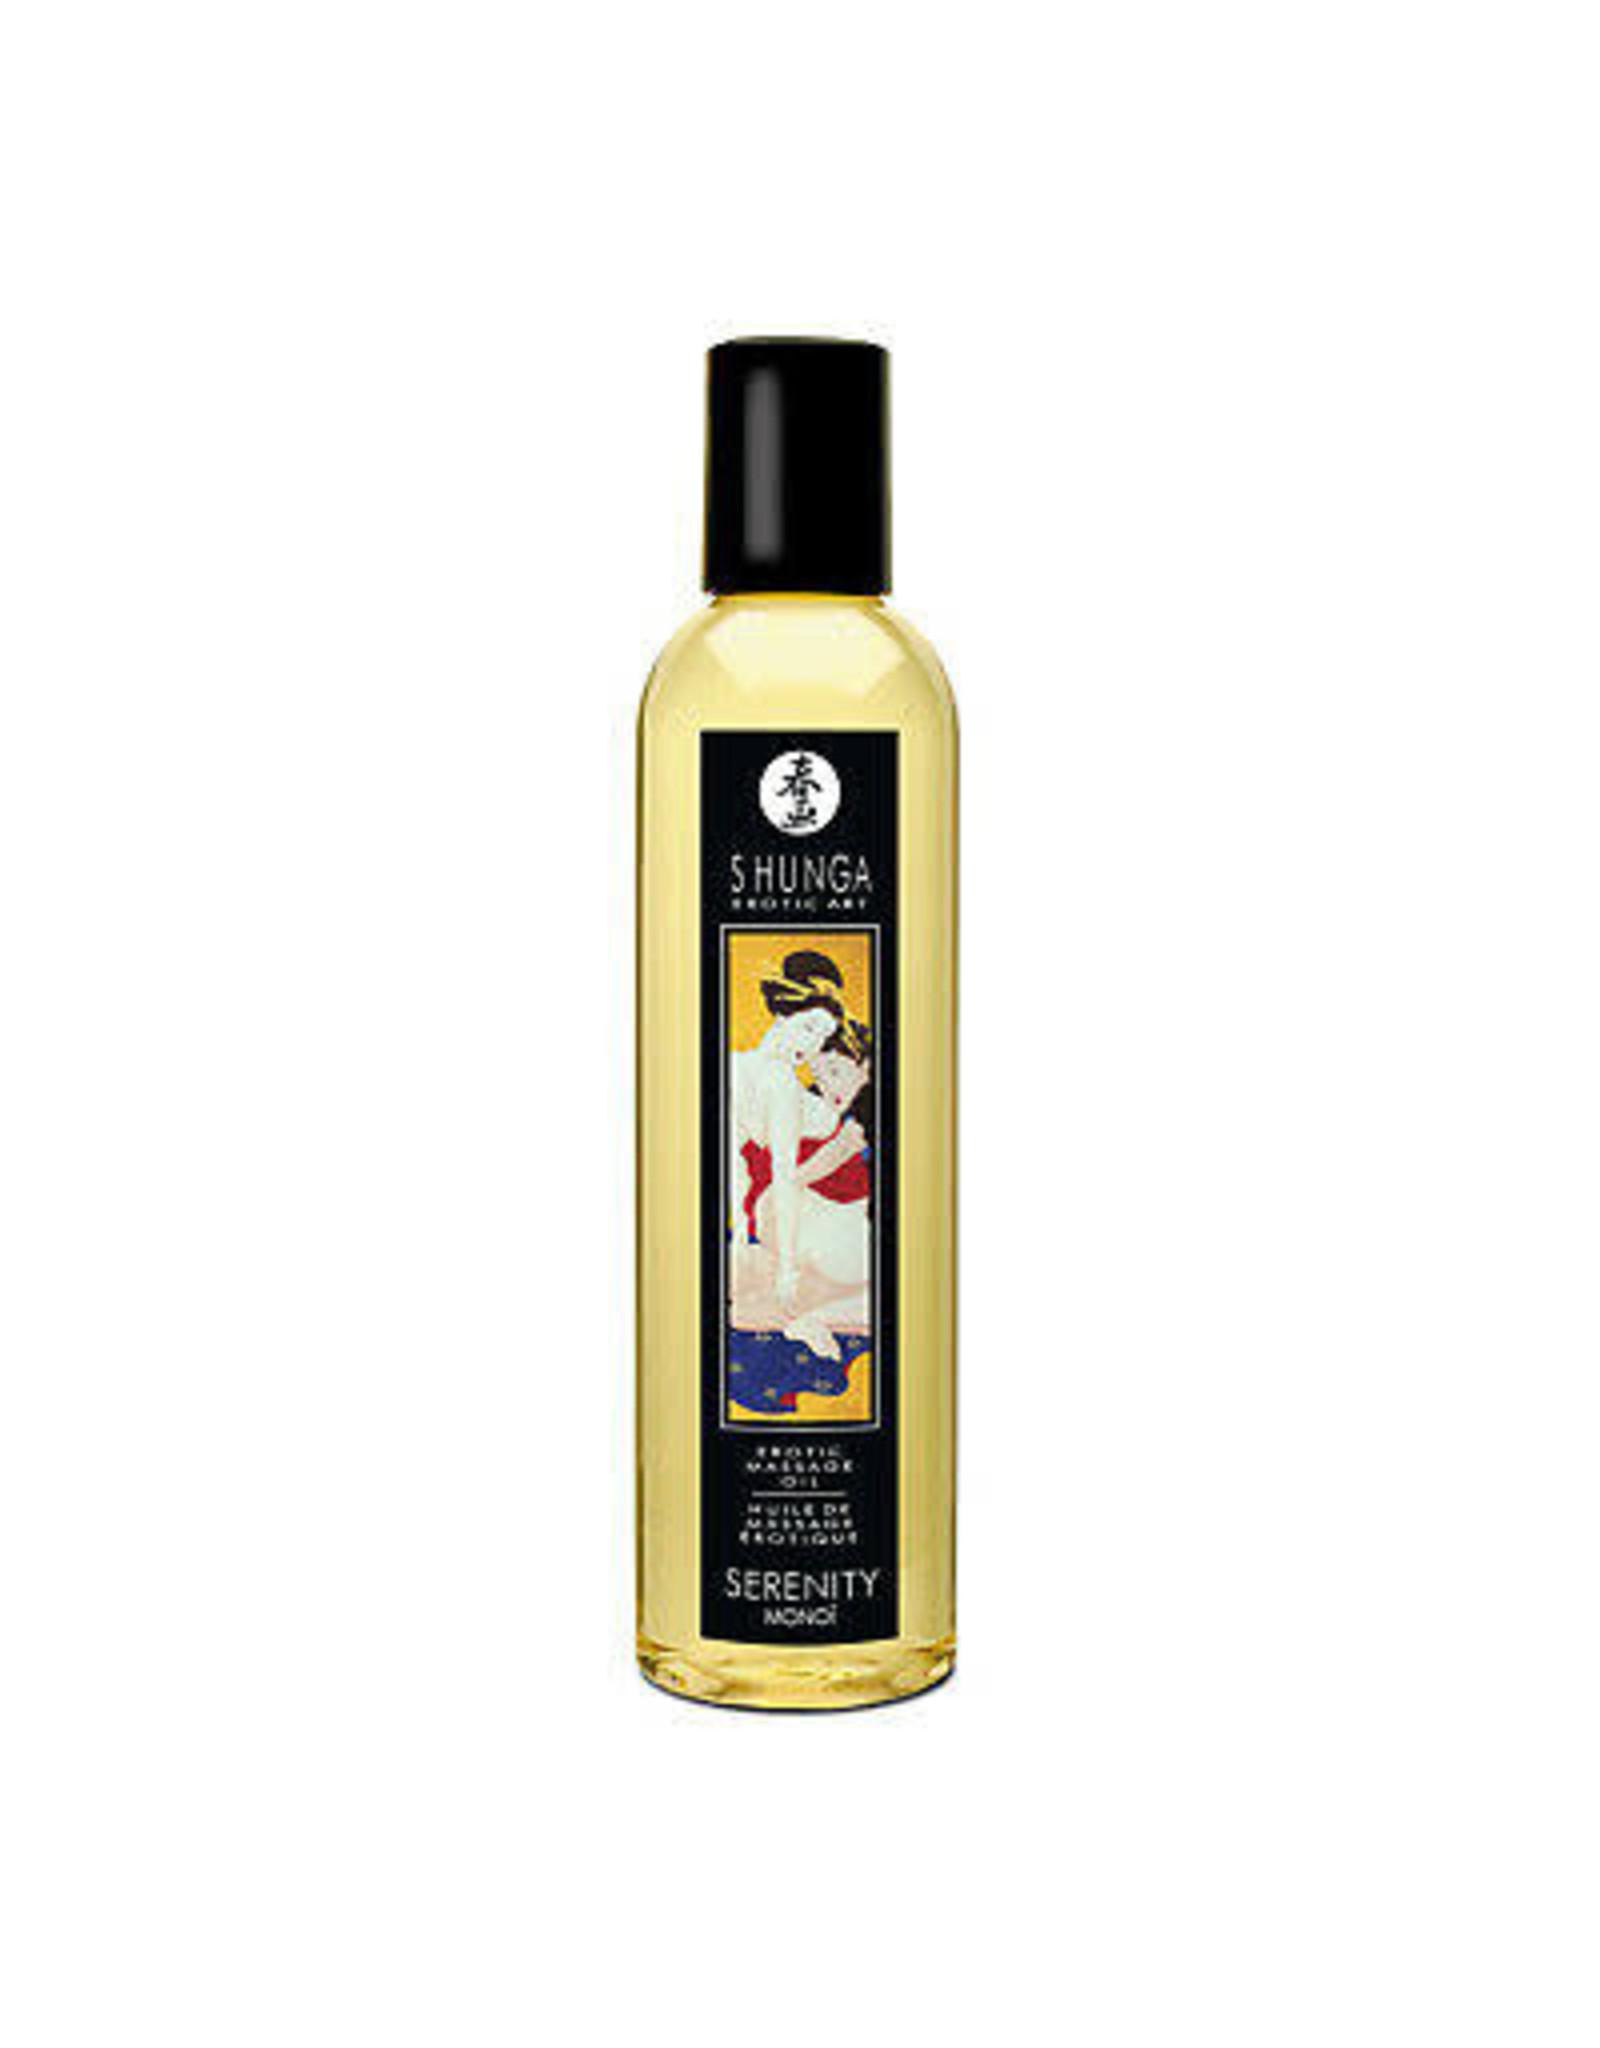 SHUNGA - EROTIC MASSAGE OIL - SERENITY (MONOI) 8oz